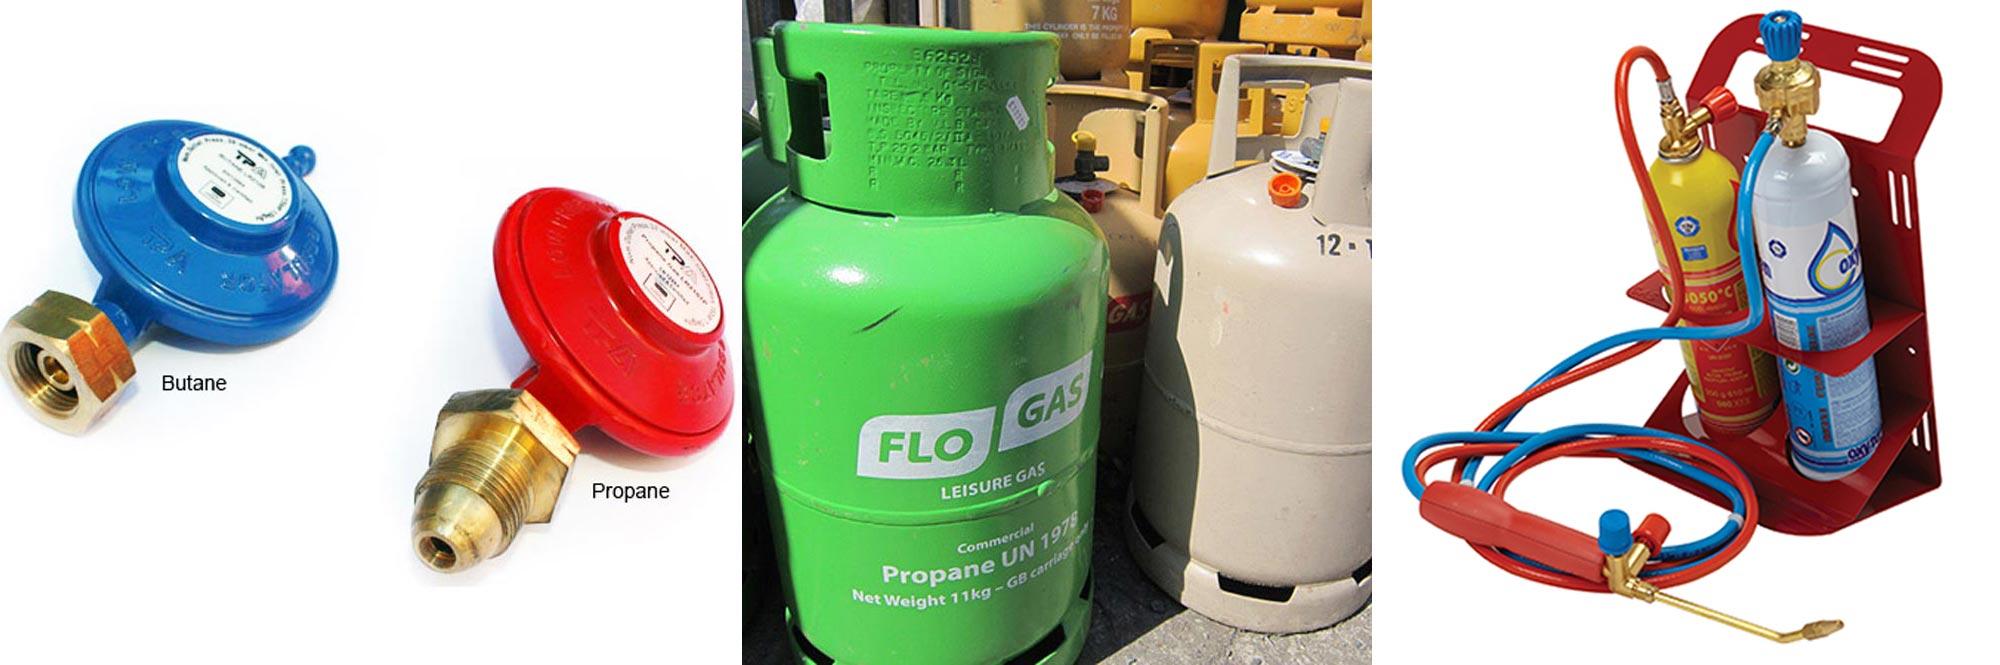 Acorn Roofing Supplies Bottles Gas